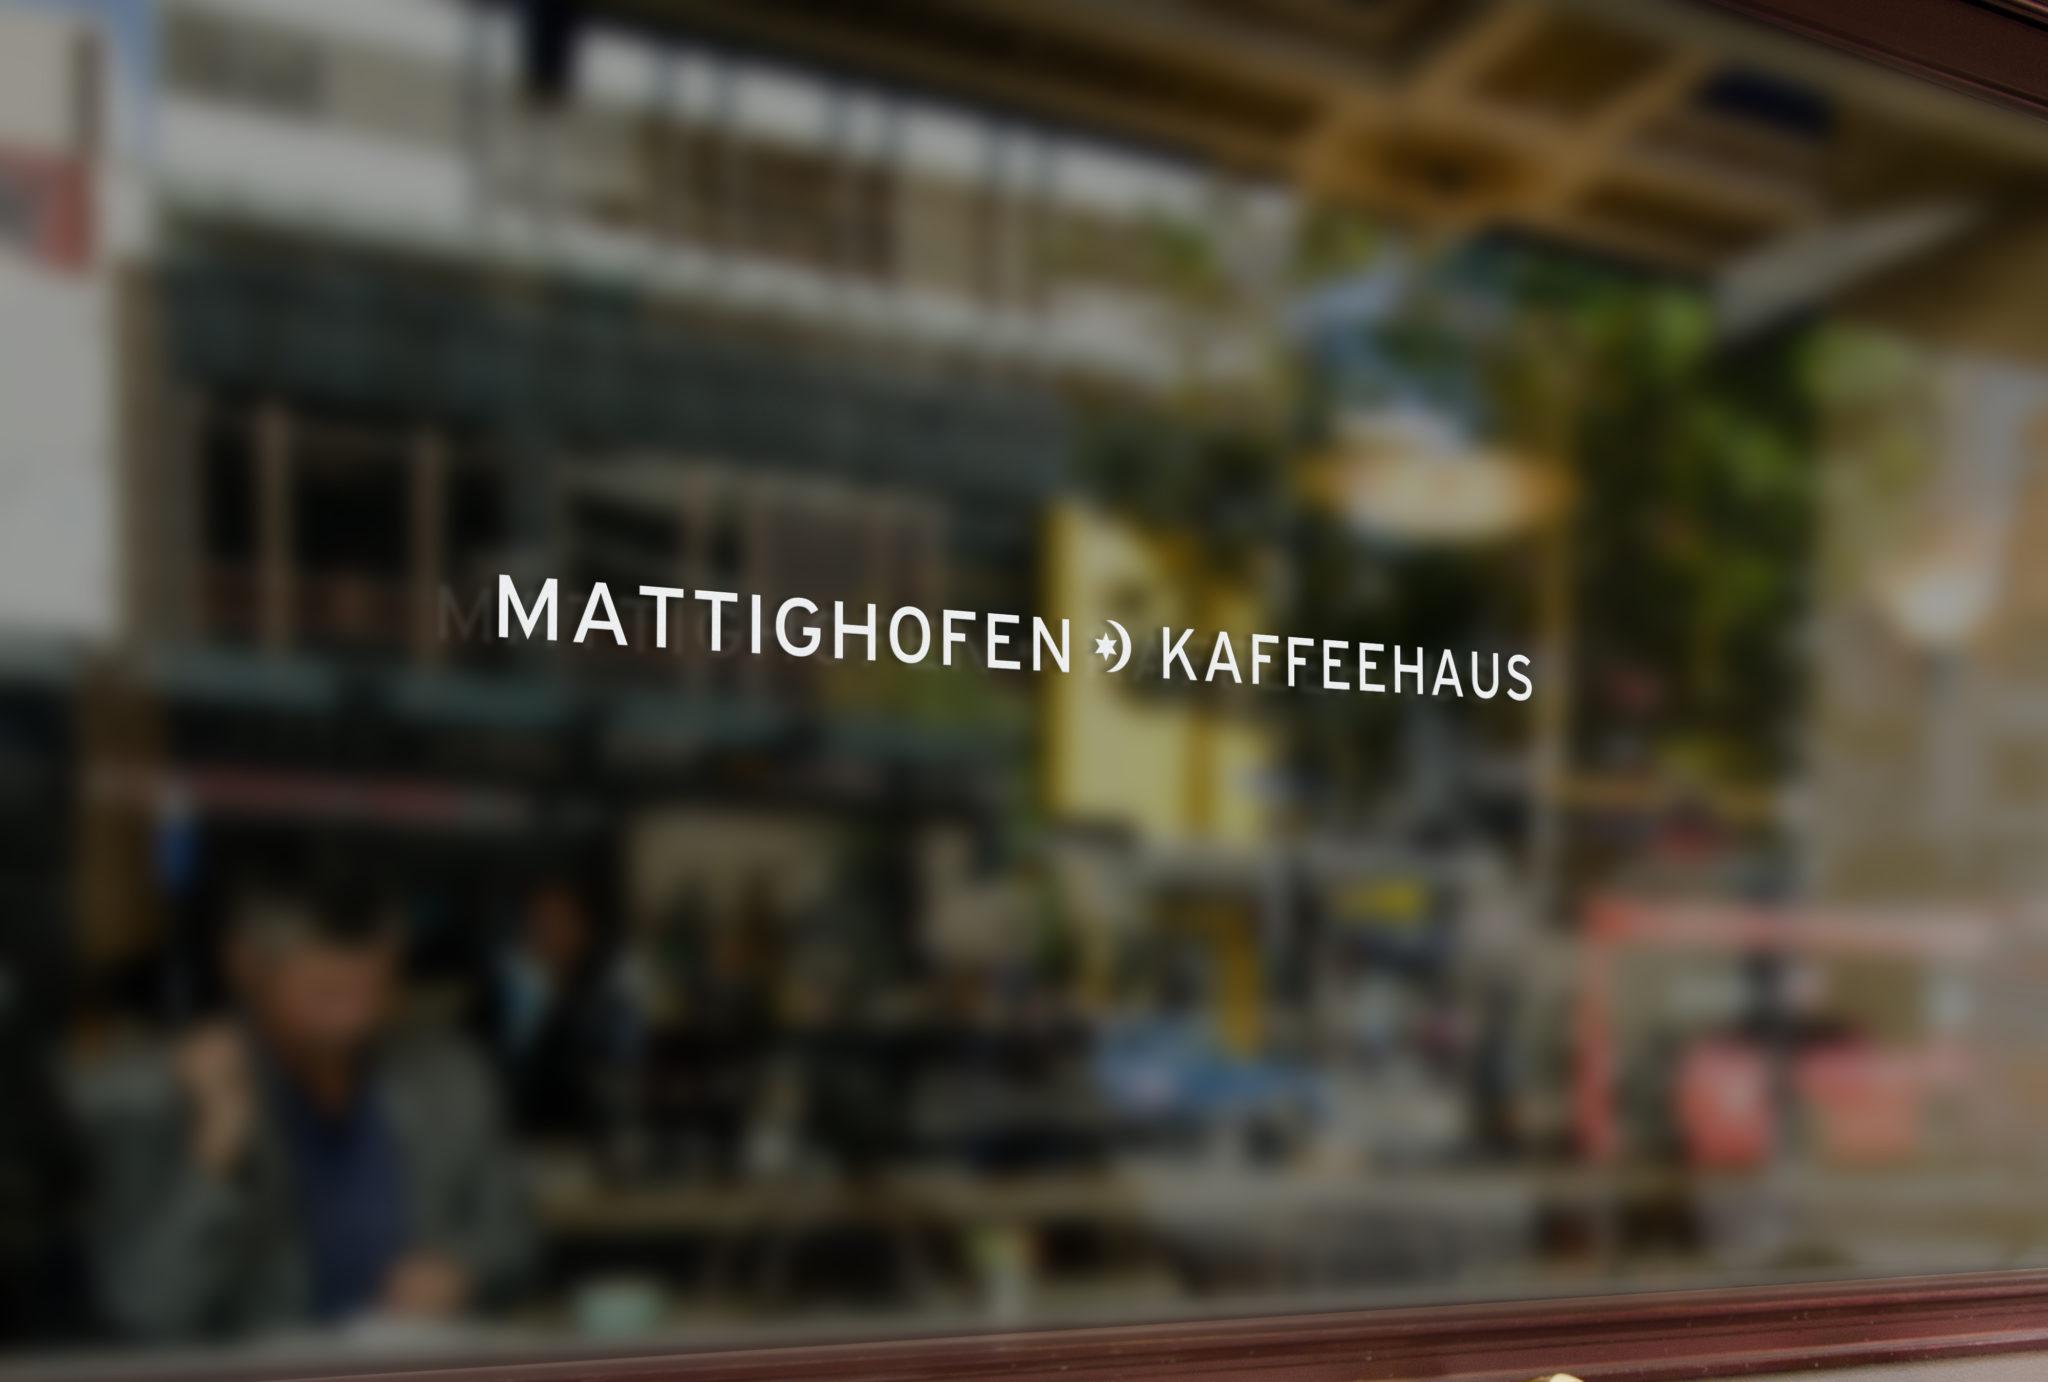 flirt.de kosten single mattighofen  TSV Mattighofen 1889 - Läufer Startseite. TSV Mattighofen 1889 - Läufer Startseite.